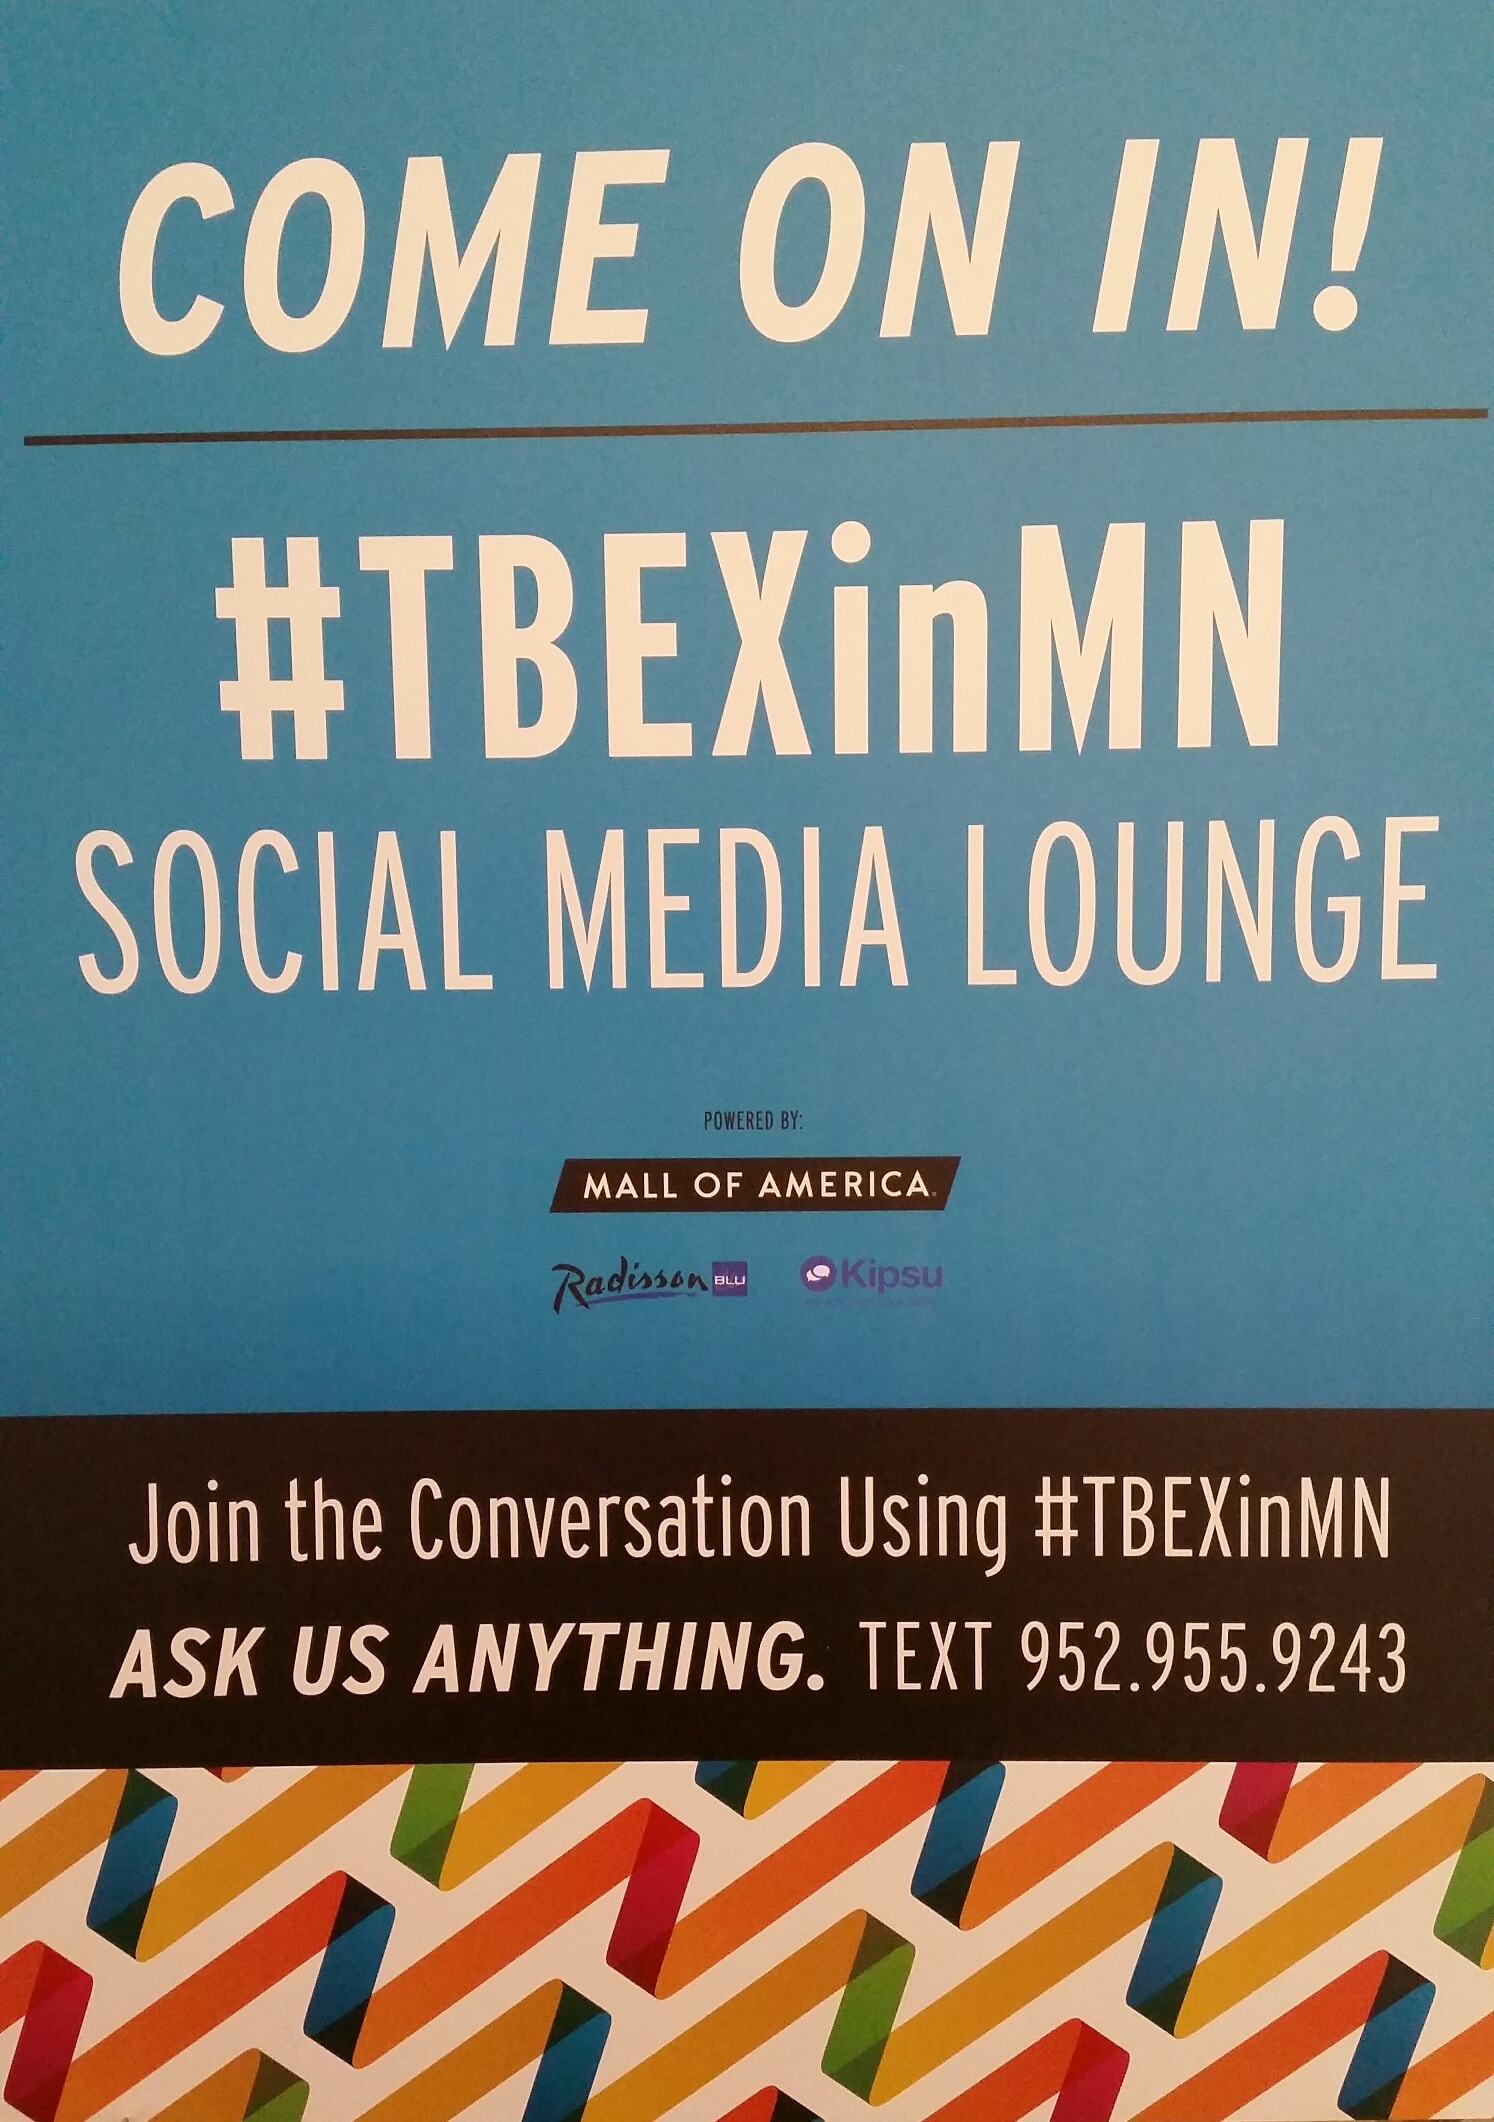 TBEX Social Media Lounge